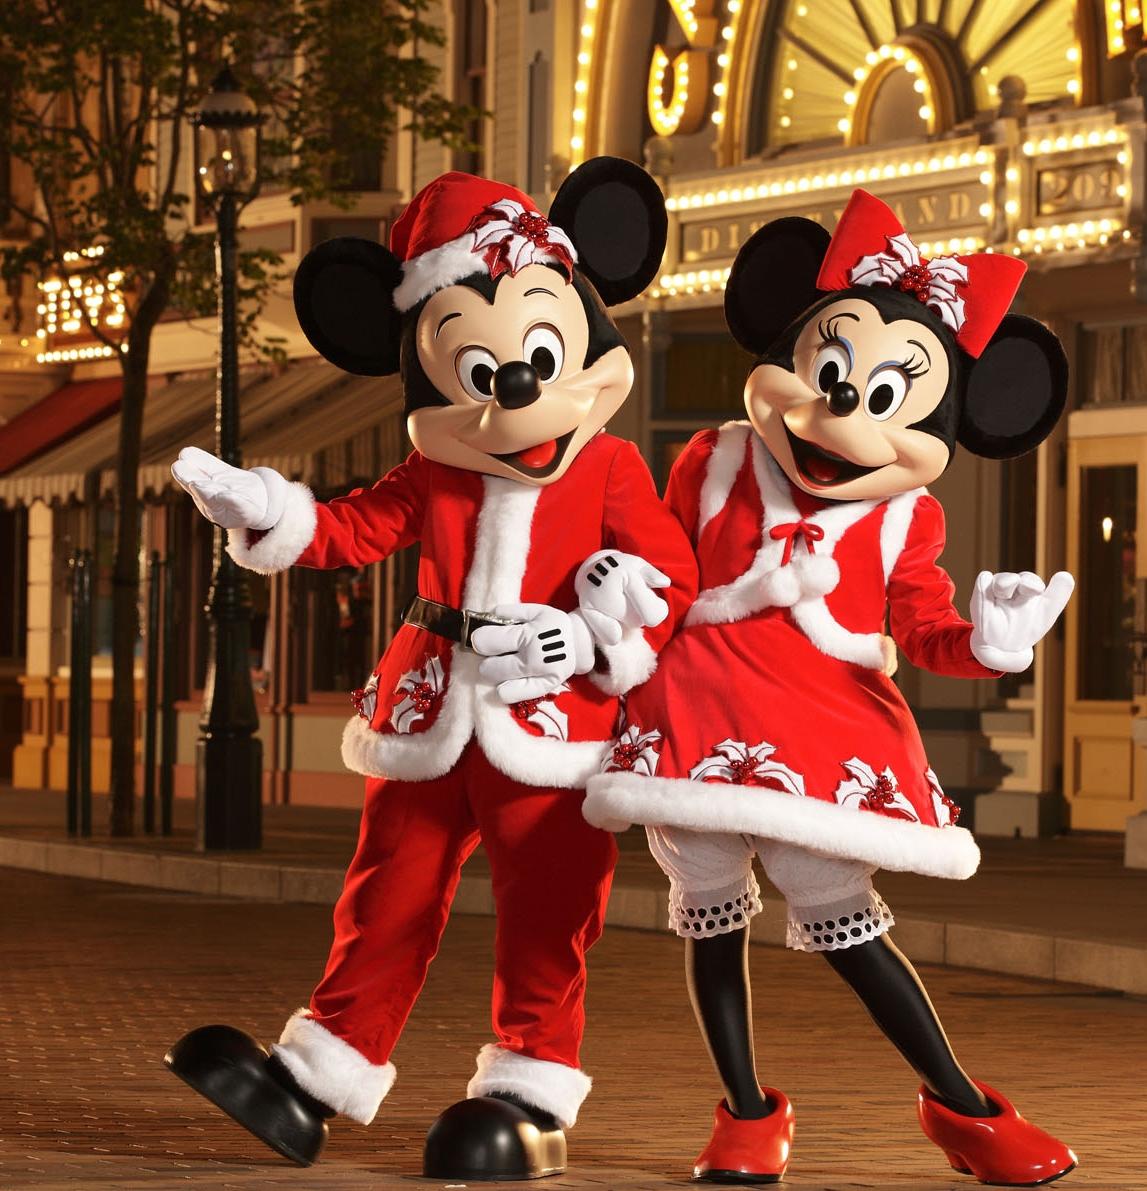 disney_friends_in_their_new_christmas_c_0_original - Disney Christmas Party 2015